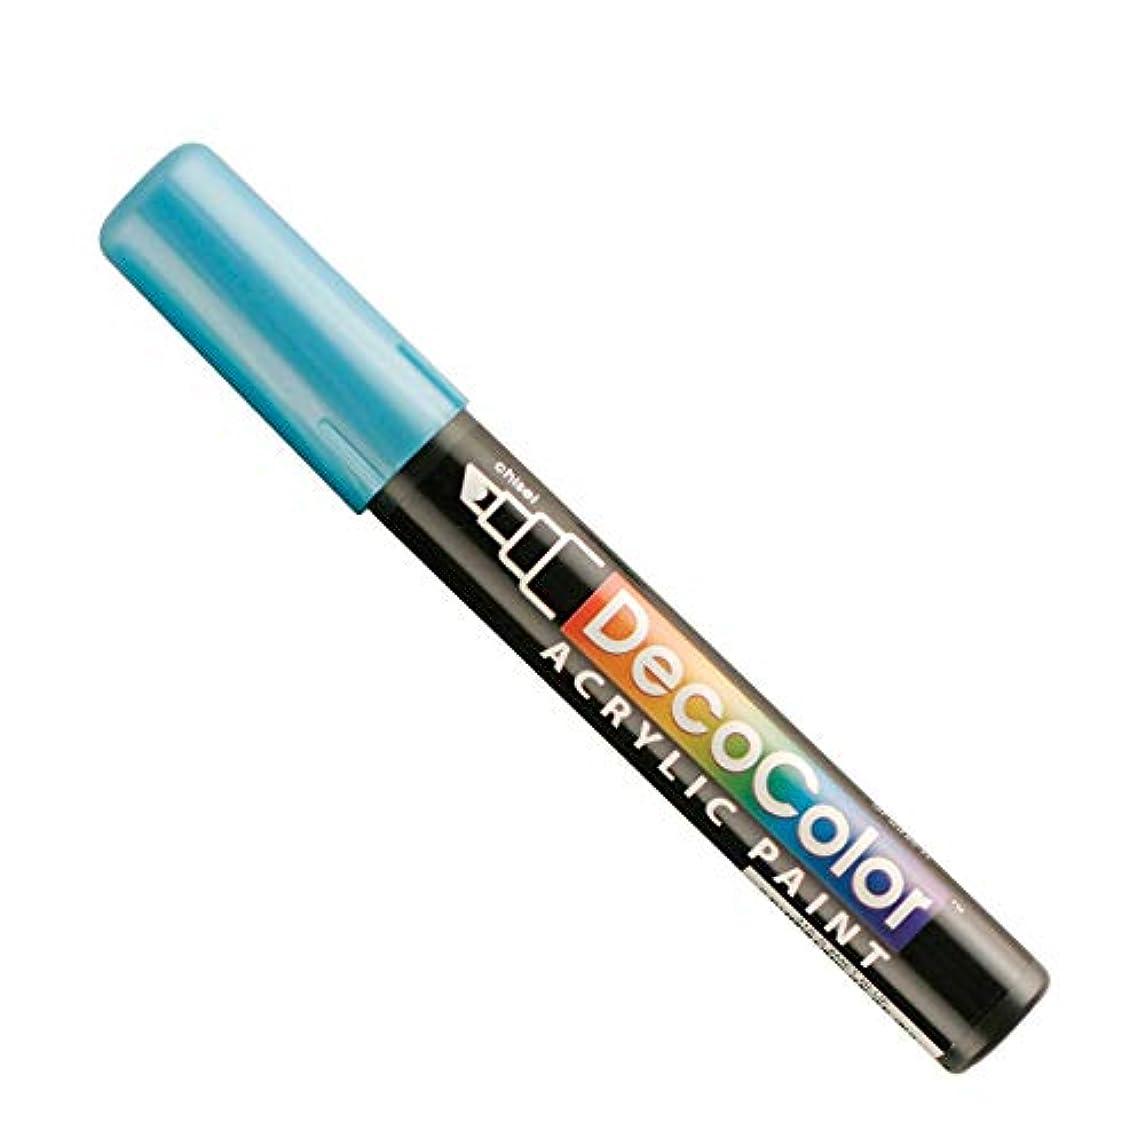 DecoColor 315-S-M3 Acryic Paint Marker Metallic, Blue